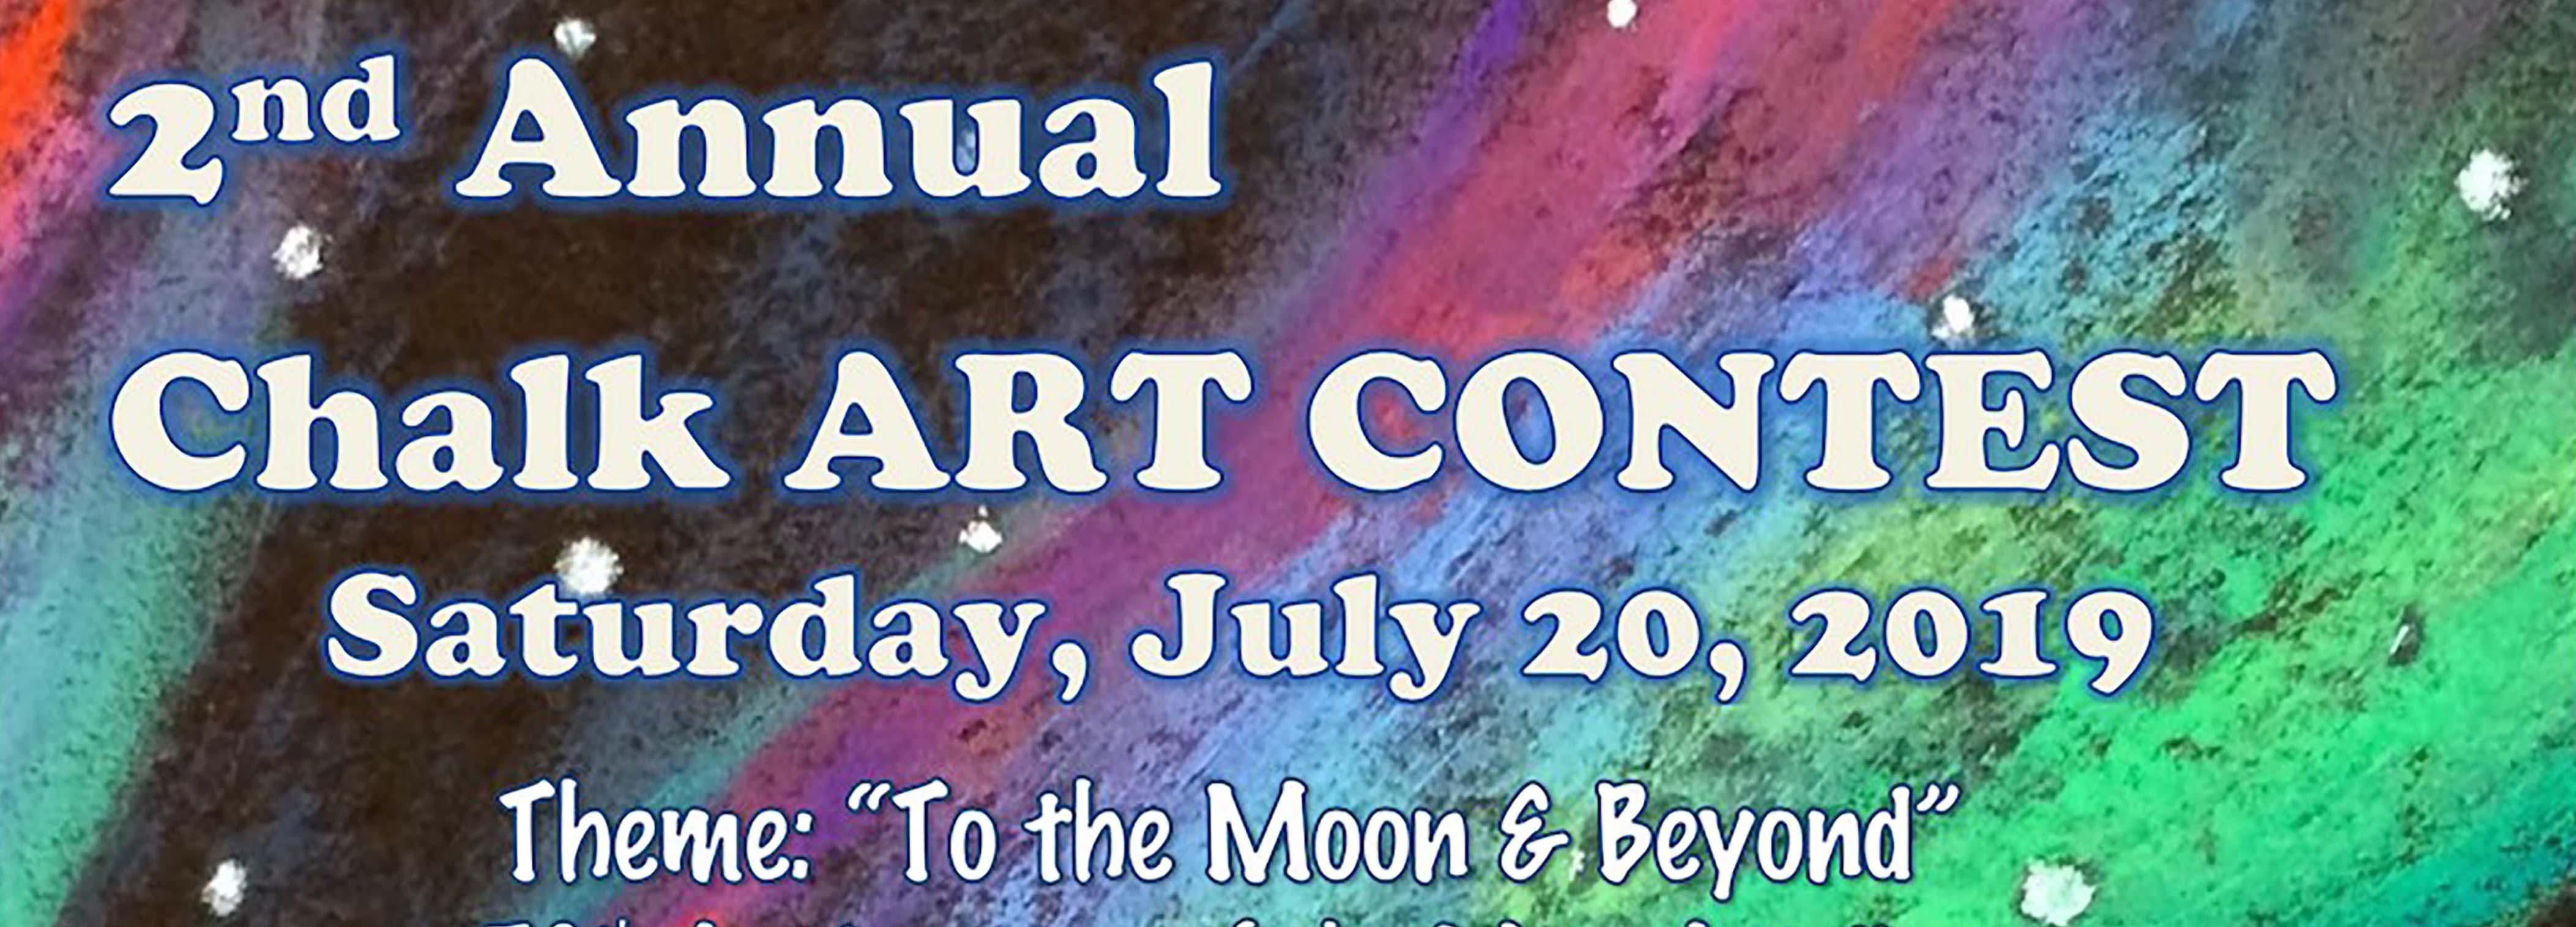 Chalk Art Contest July 20 at 8am